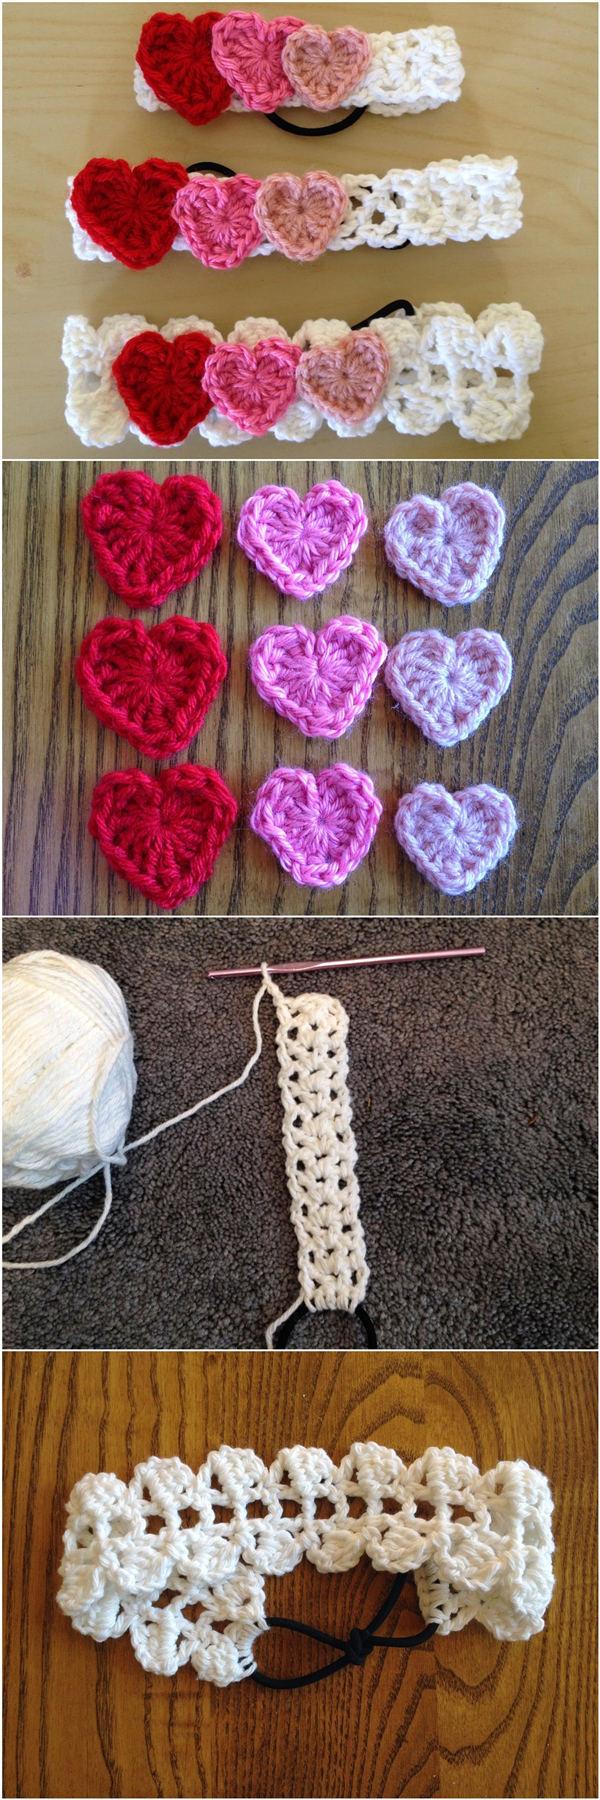 Free Crochet Pattern: Valentine's Day Headbands